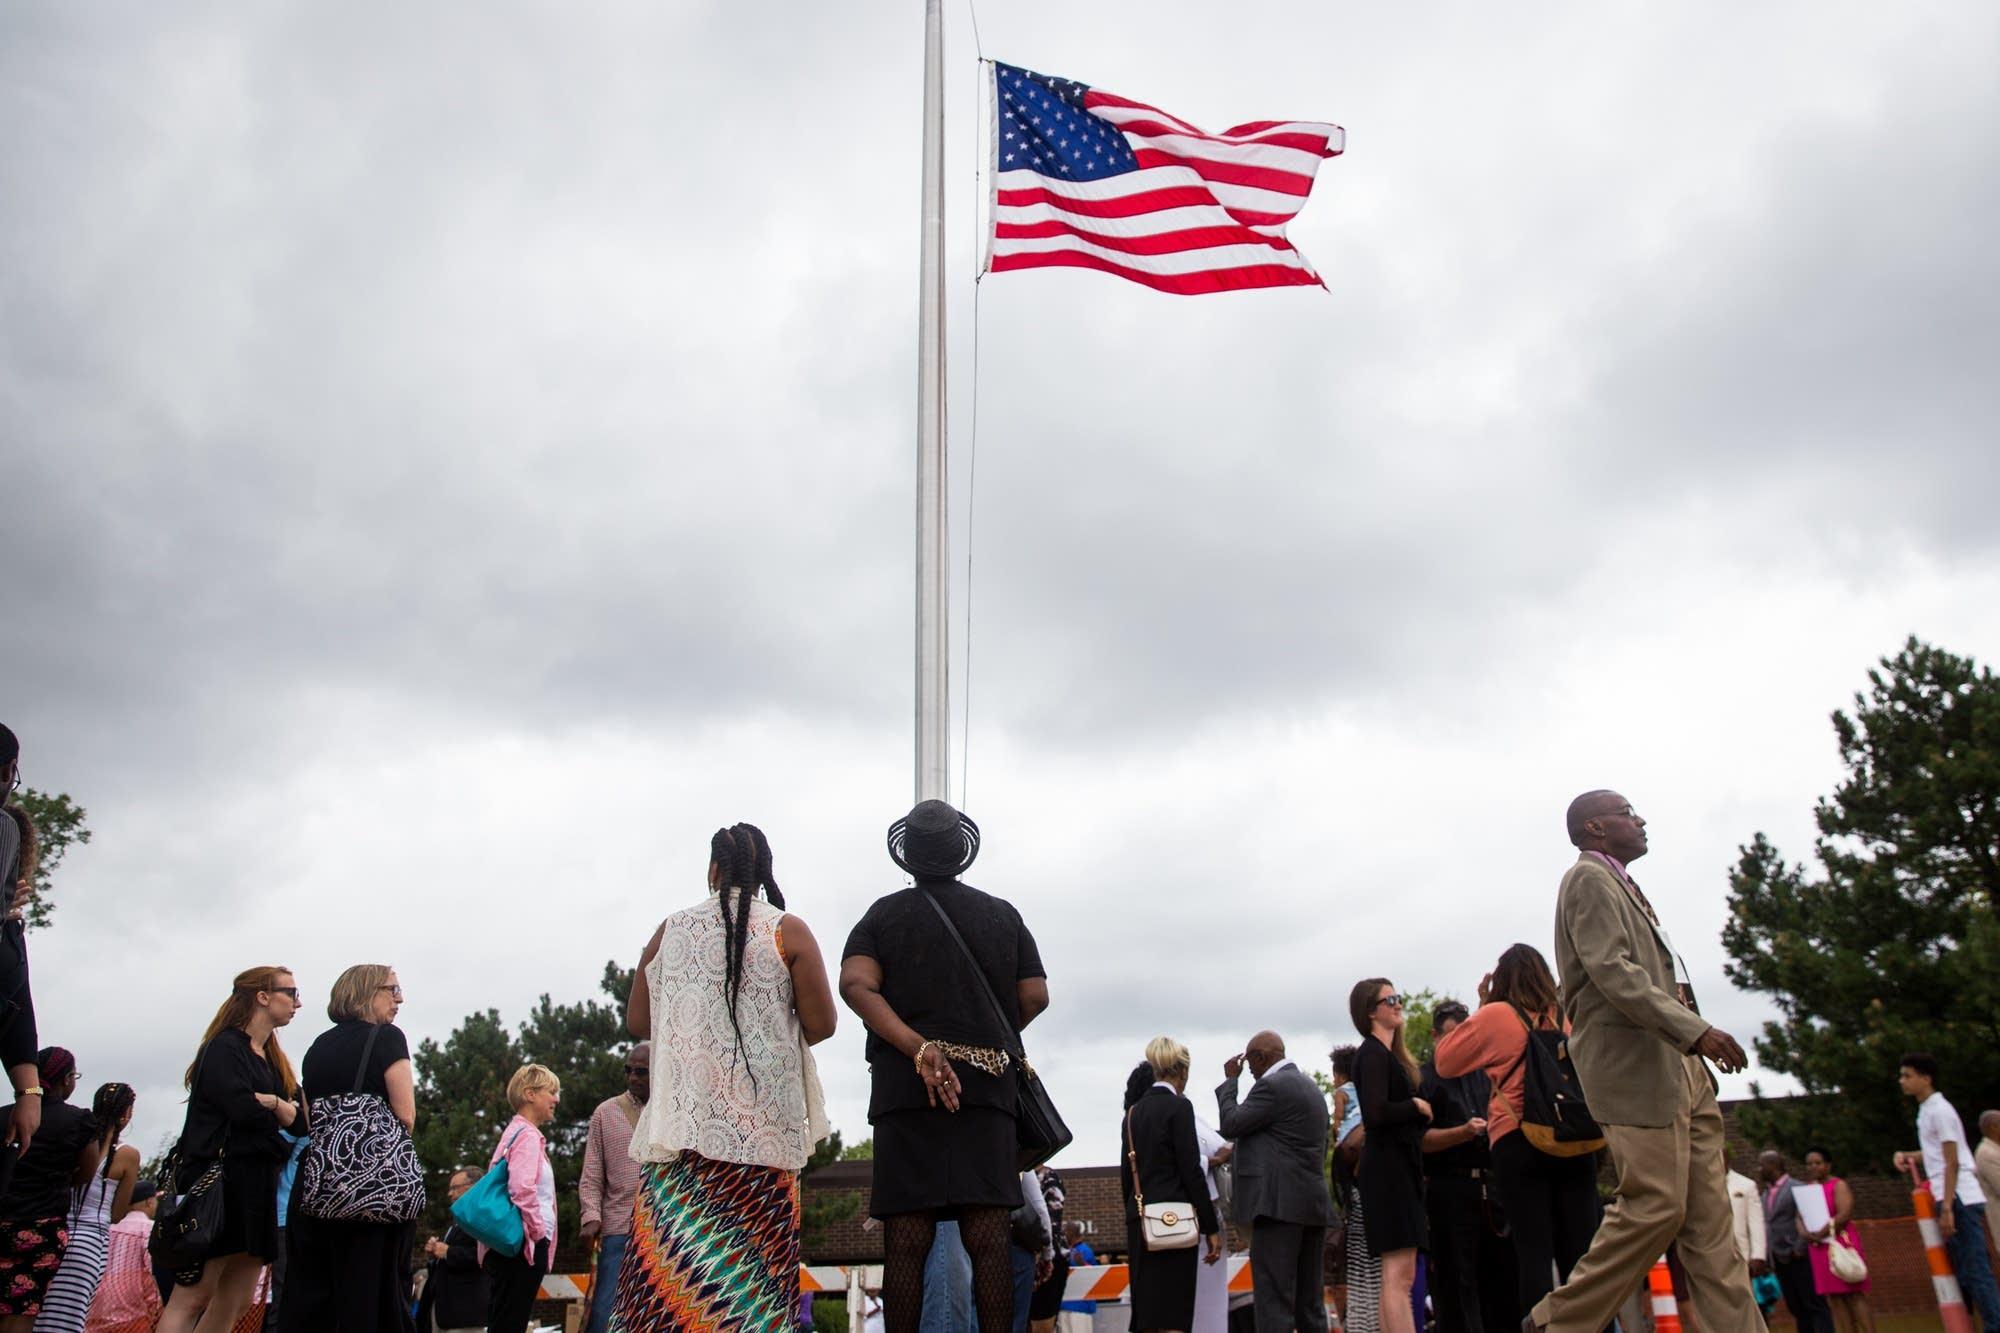 The flag outside J.J. Hill flies at half staff.